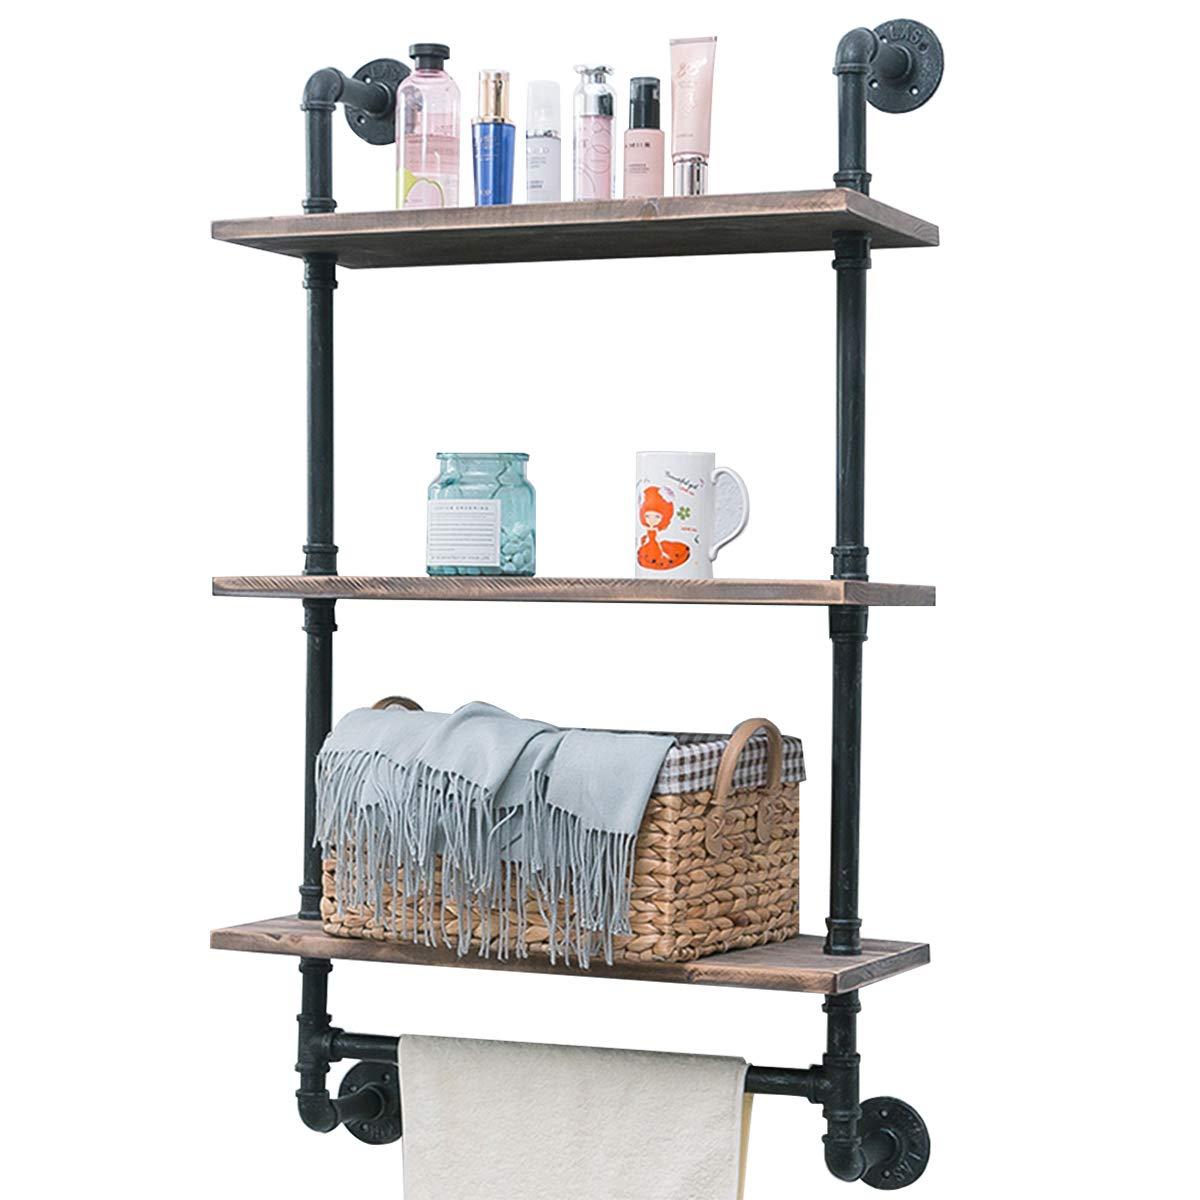 Industrial Pipe Shelf,Rustic Wall Shelf with Towel Bar,24'' Towel Racks for Bathroom,3 Tiered Pipe Shelves Wood Shelf Shelving